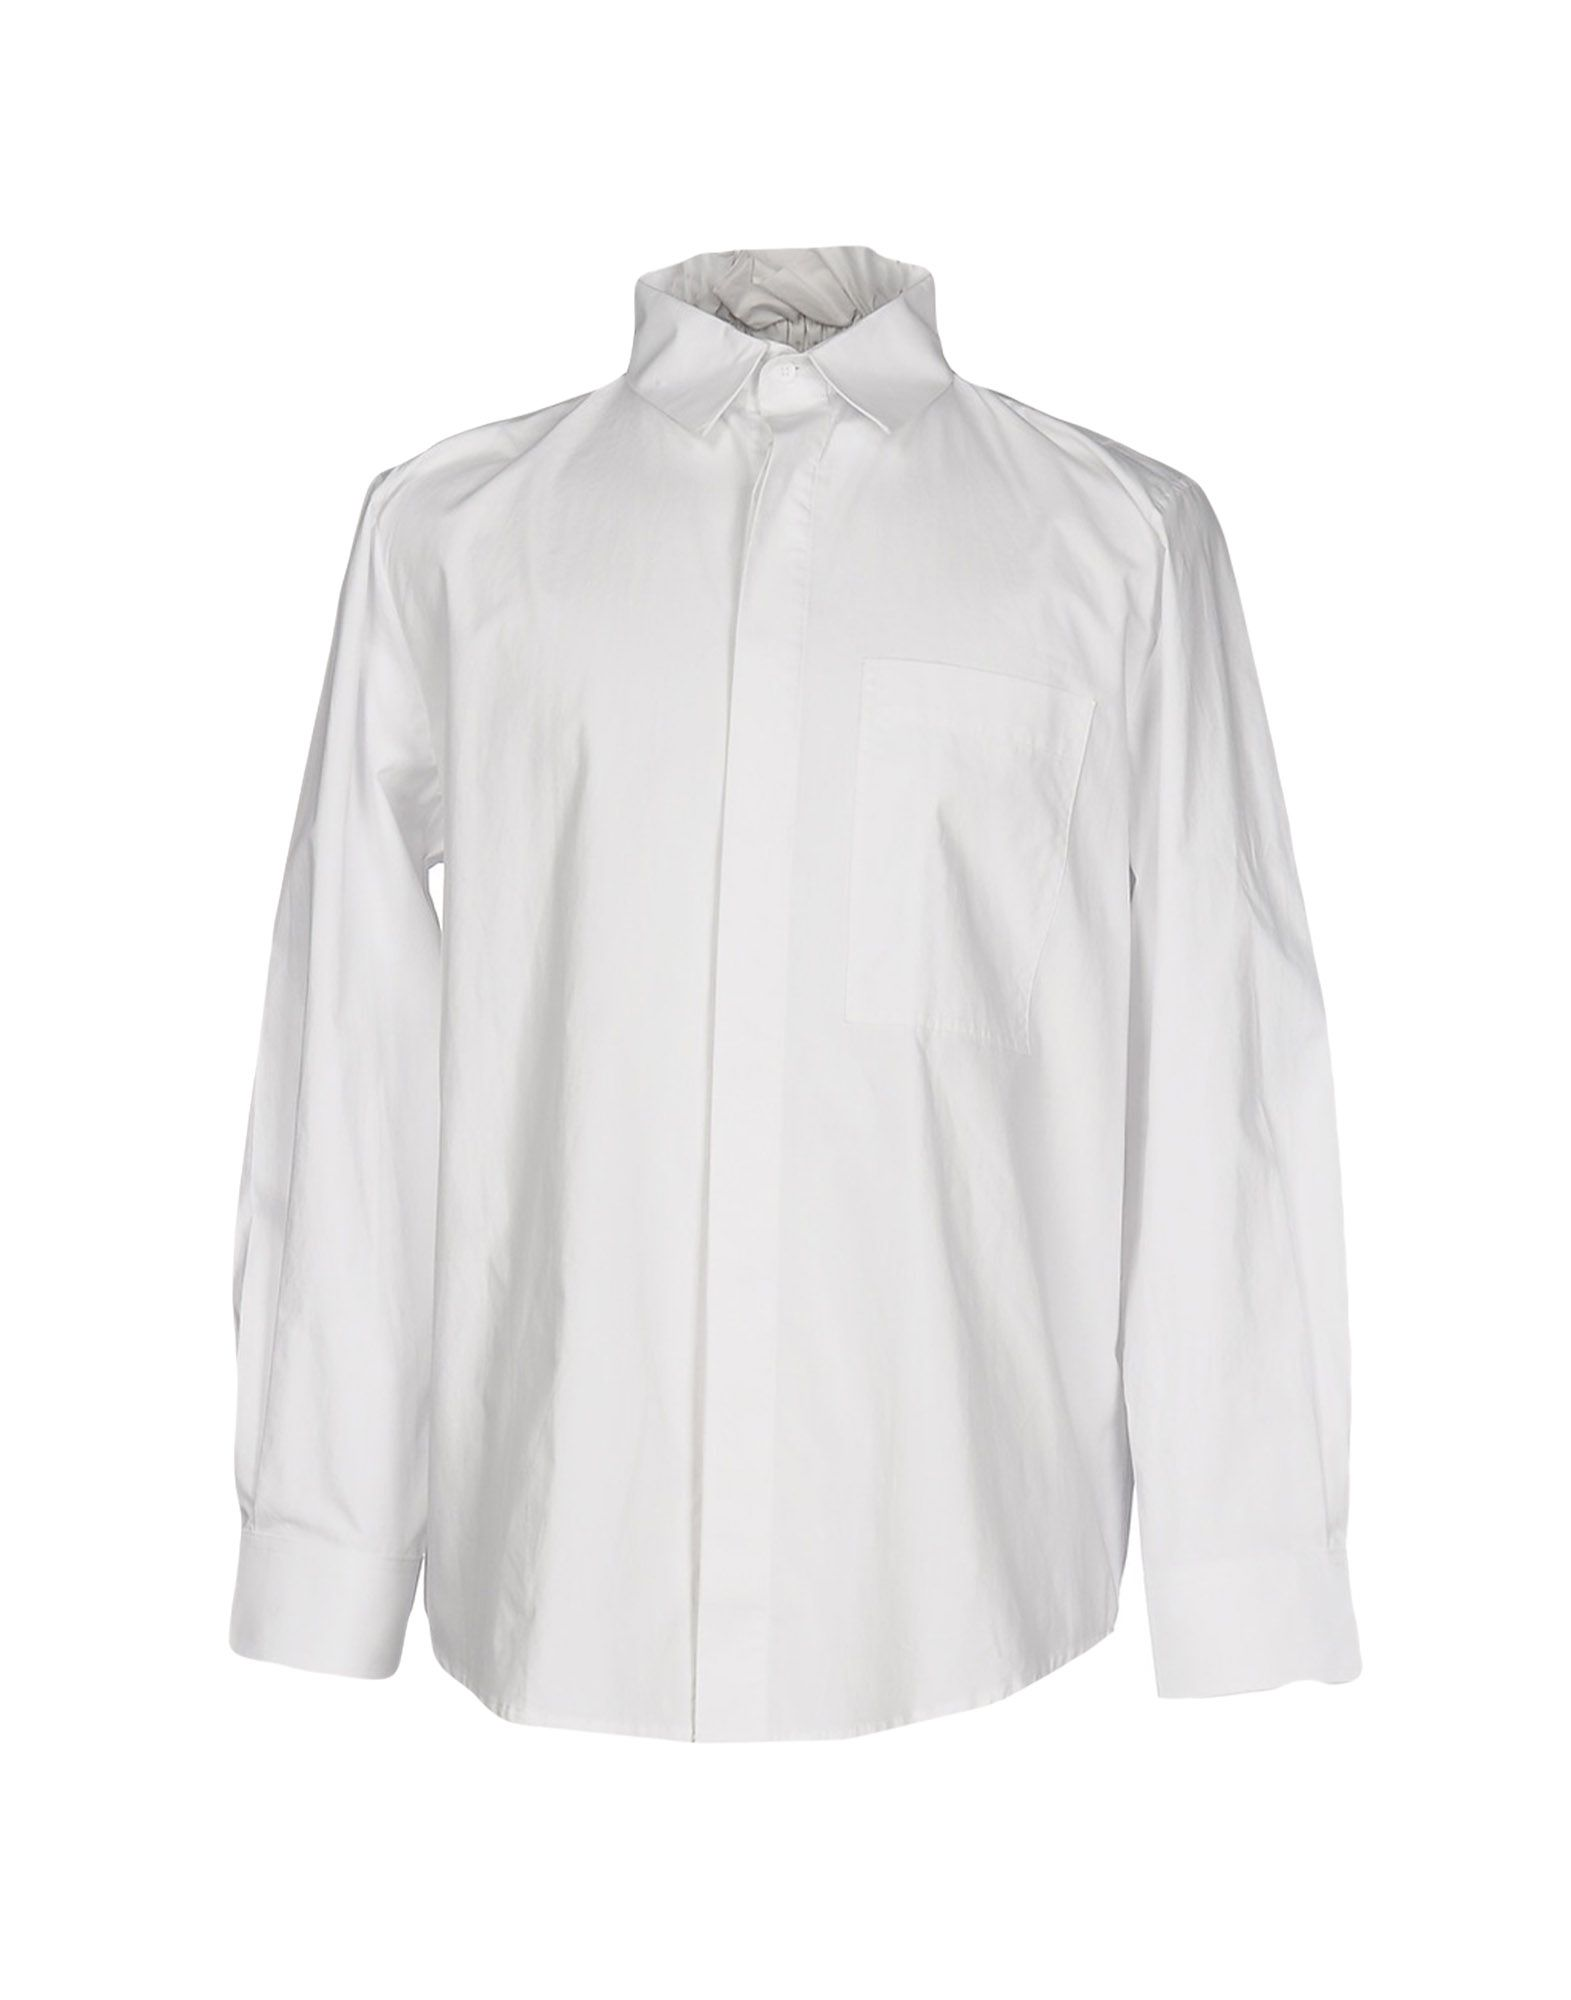 все цены на CRAIG GREEN Pубашка онлайн